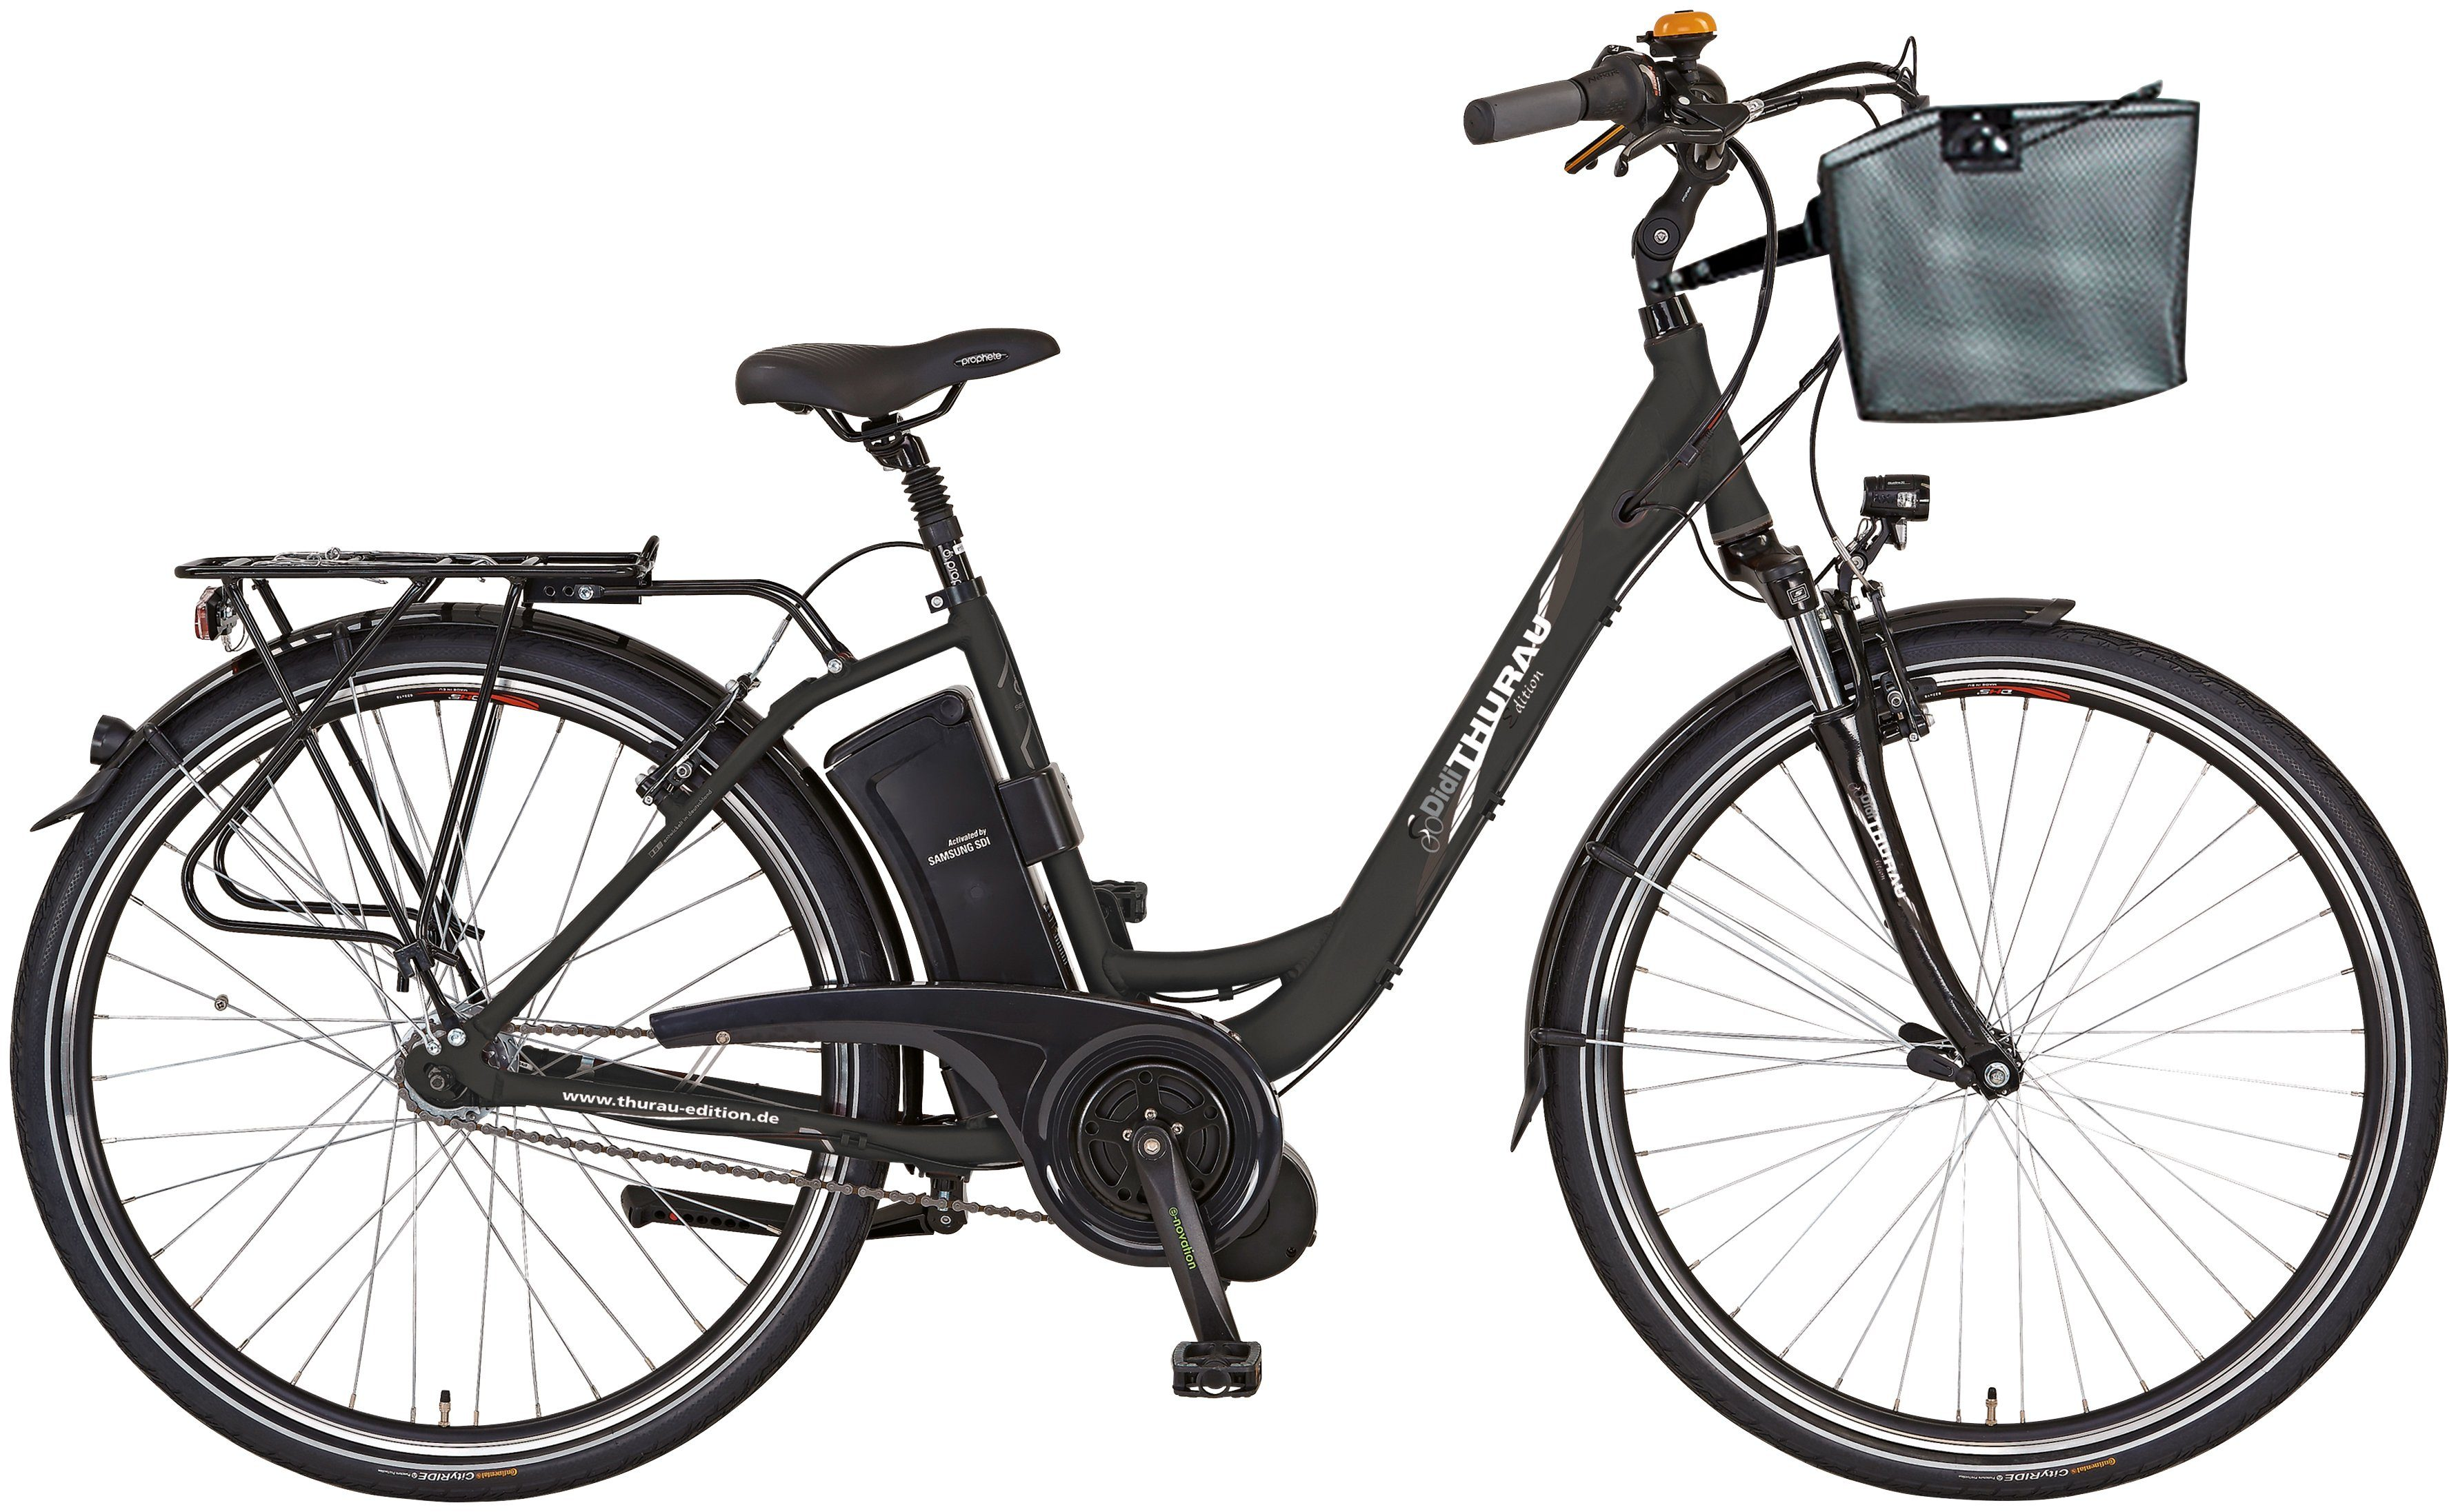 DIDI THURAU E-Bike City »Alu City Comfort 7 PLUS MM«, 28 Zoll, 7 Gang, Mittelmotor, 374 Wh